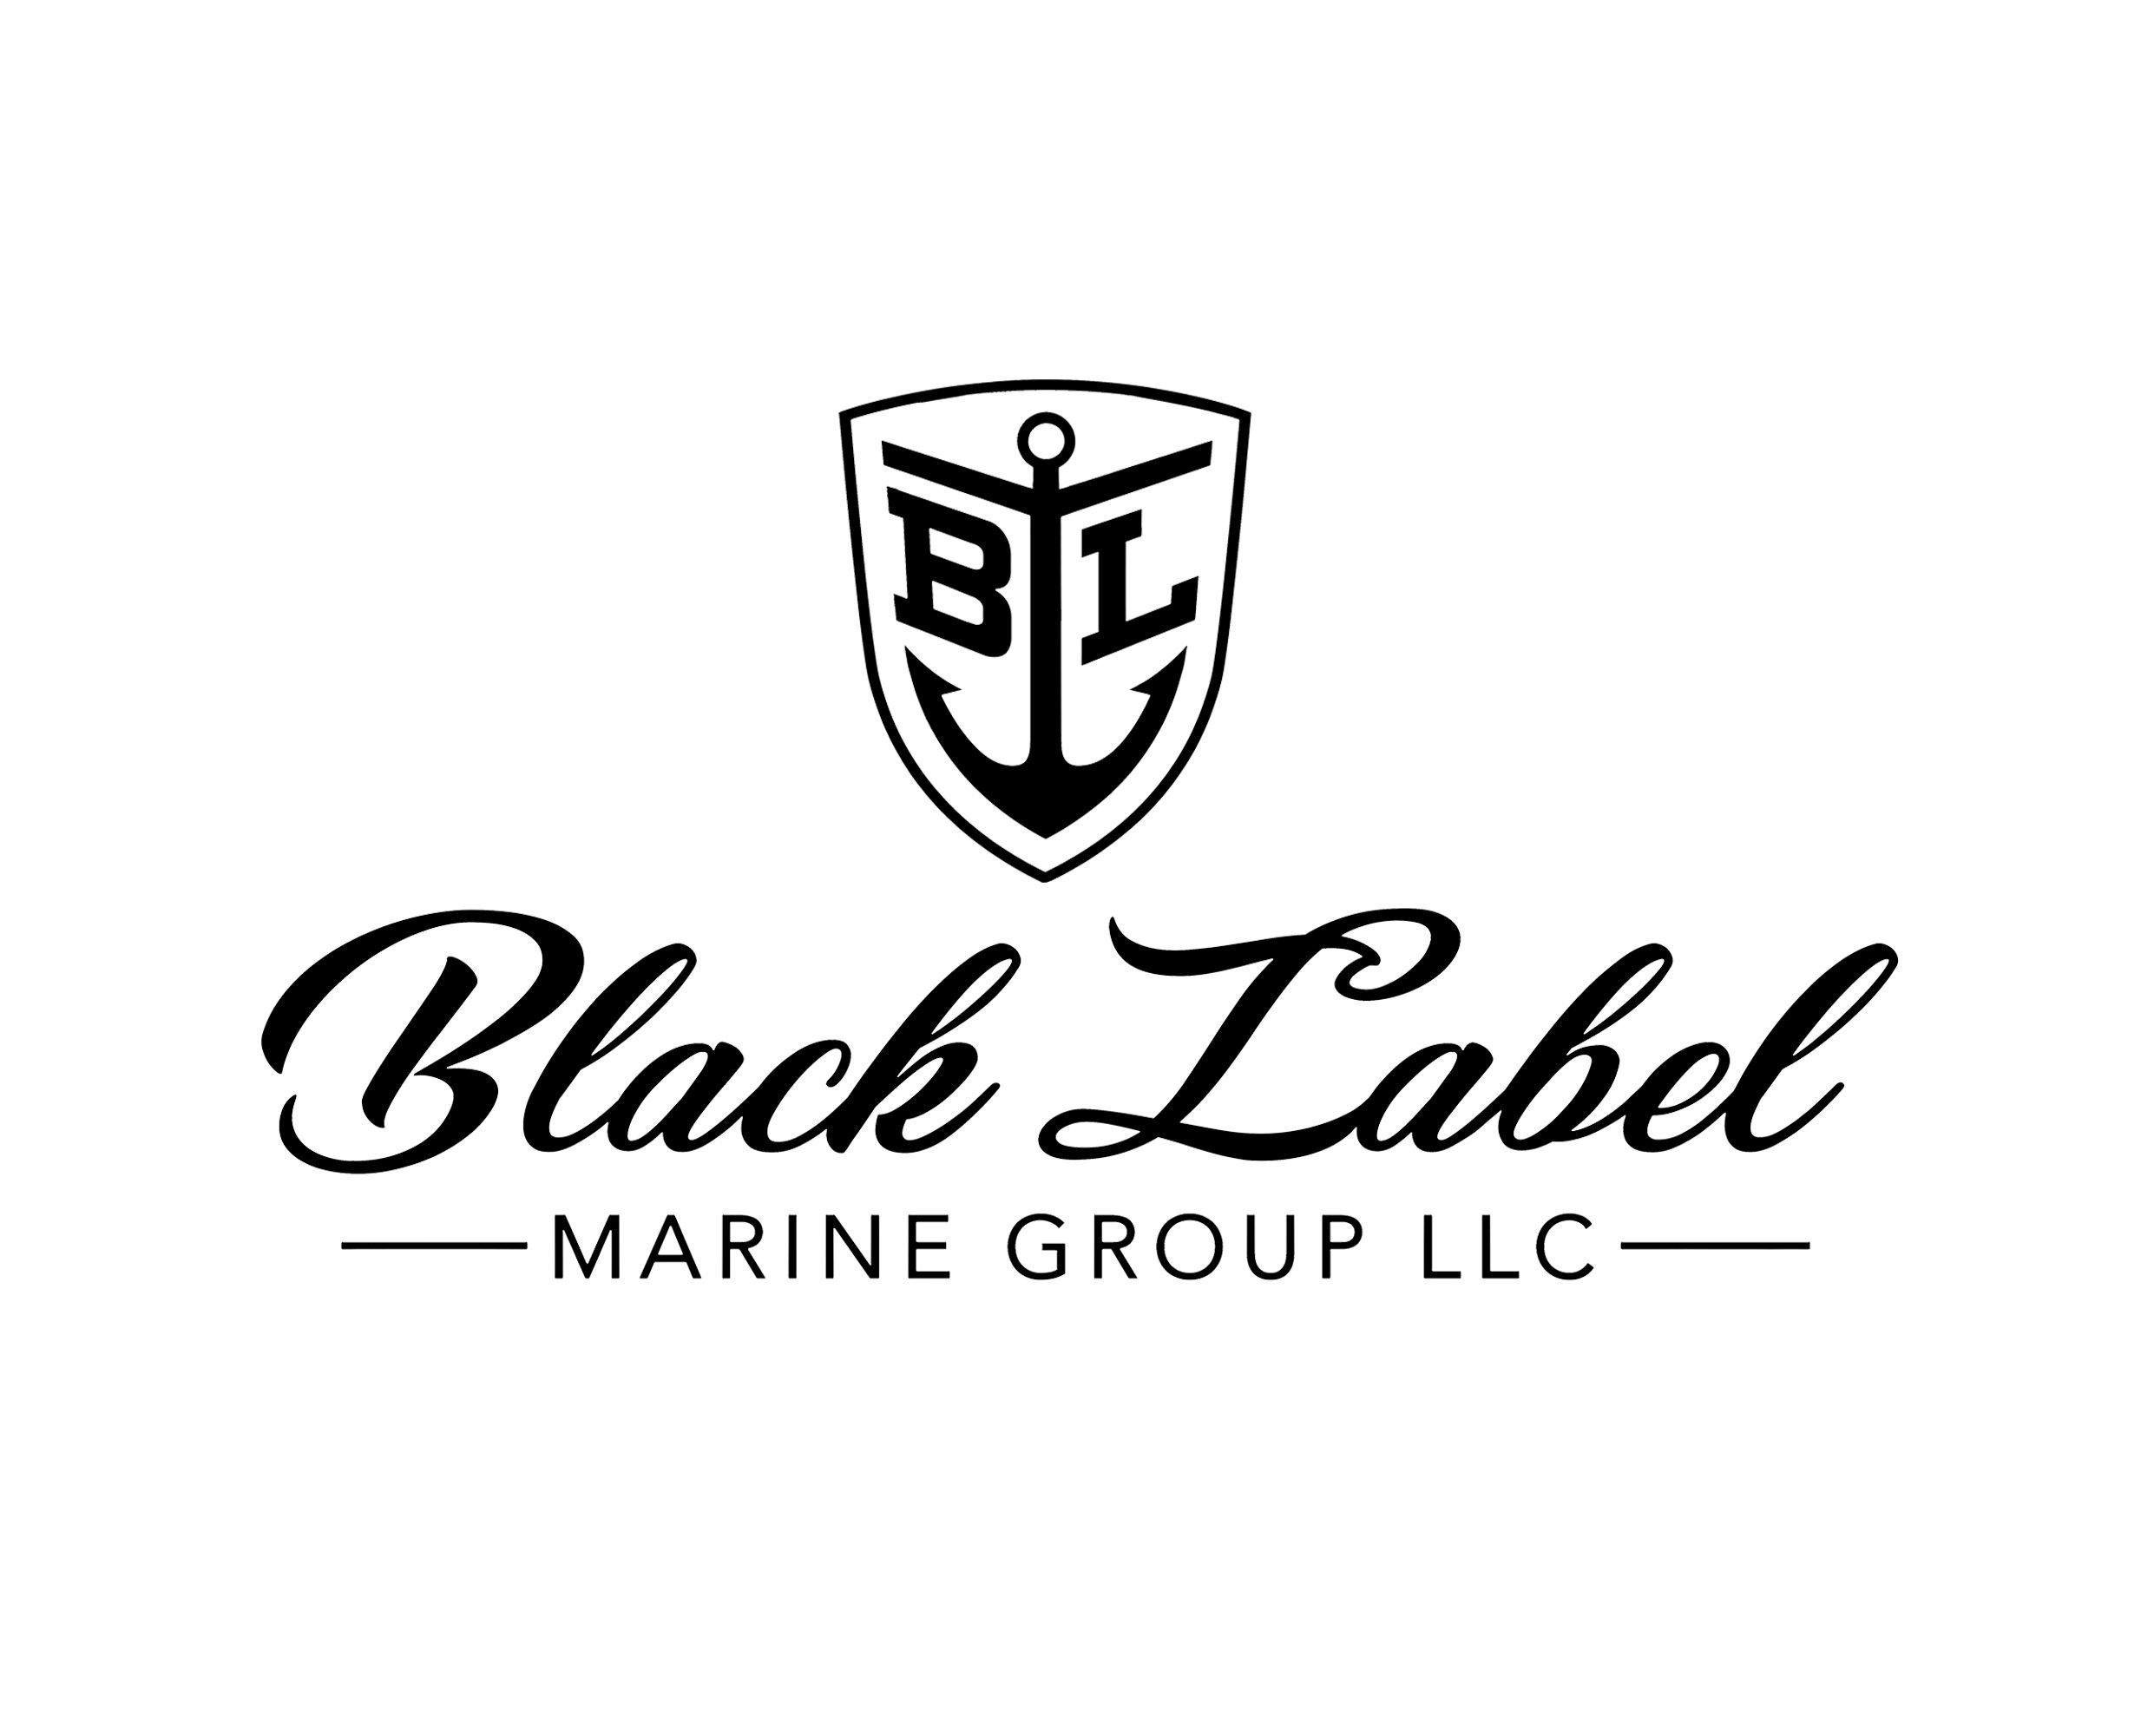 Black Label Marine Group